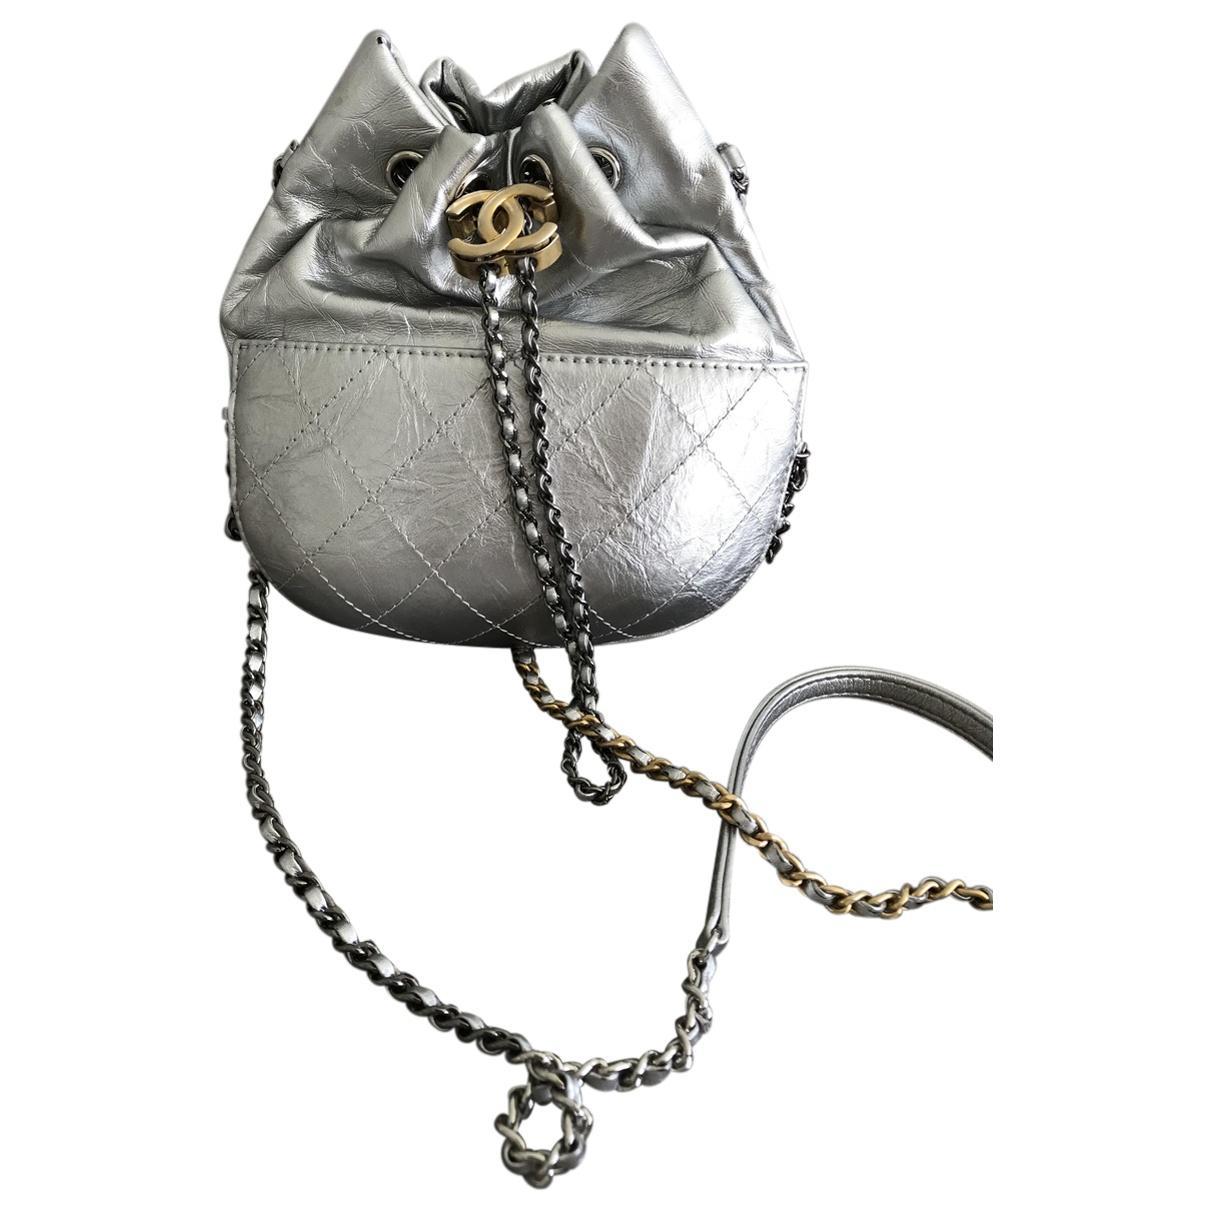 1898a181d83c Chanel Gabrielle Metallic Leather Handbag in Metallic - Lyst